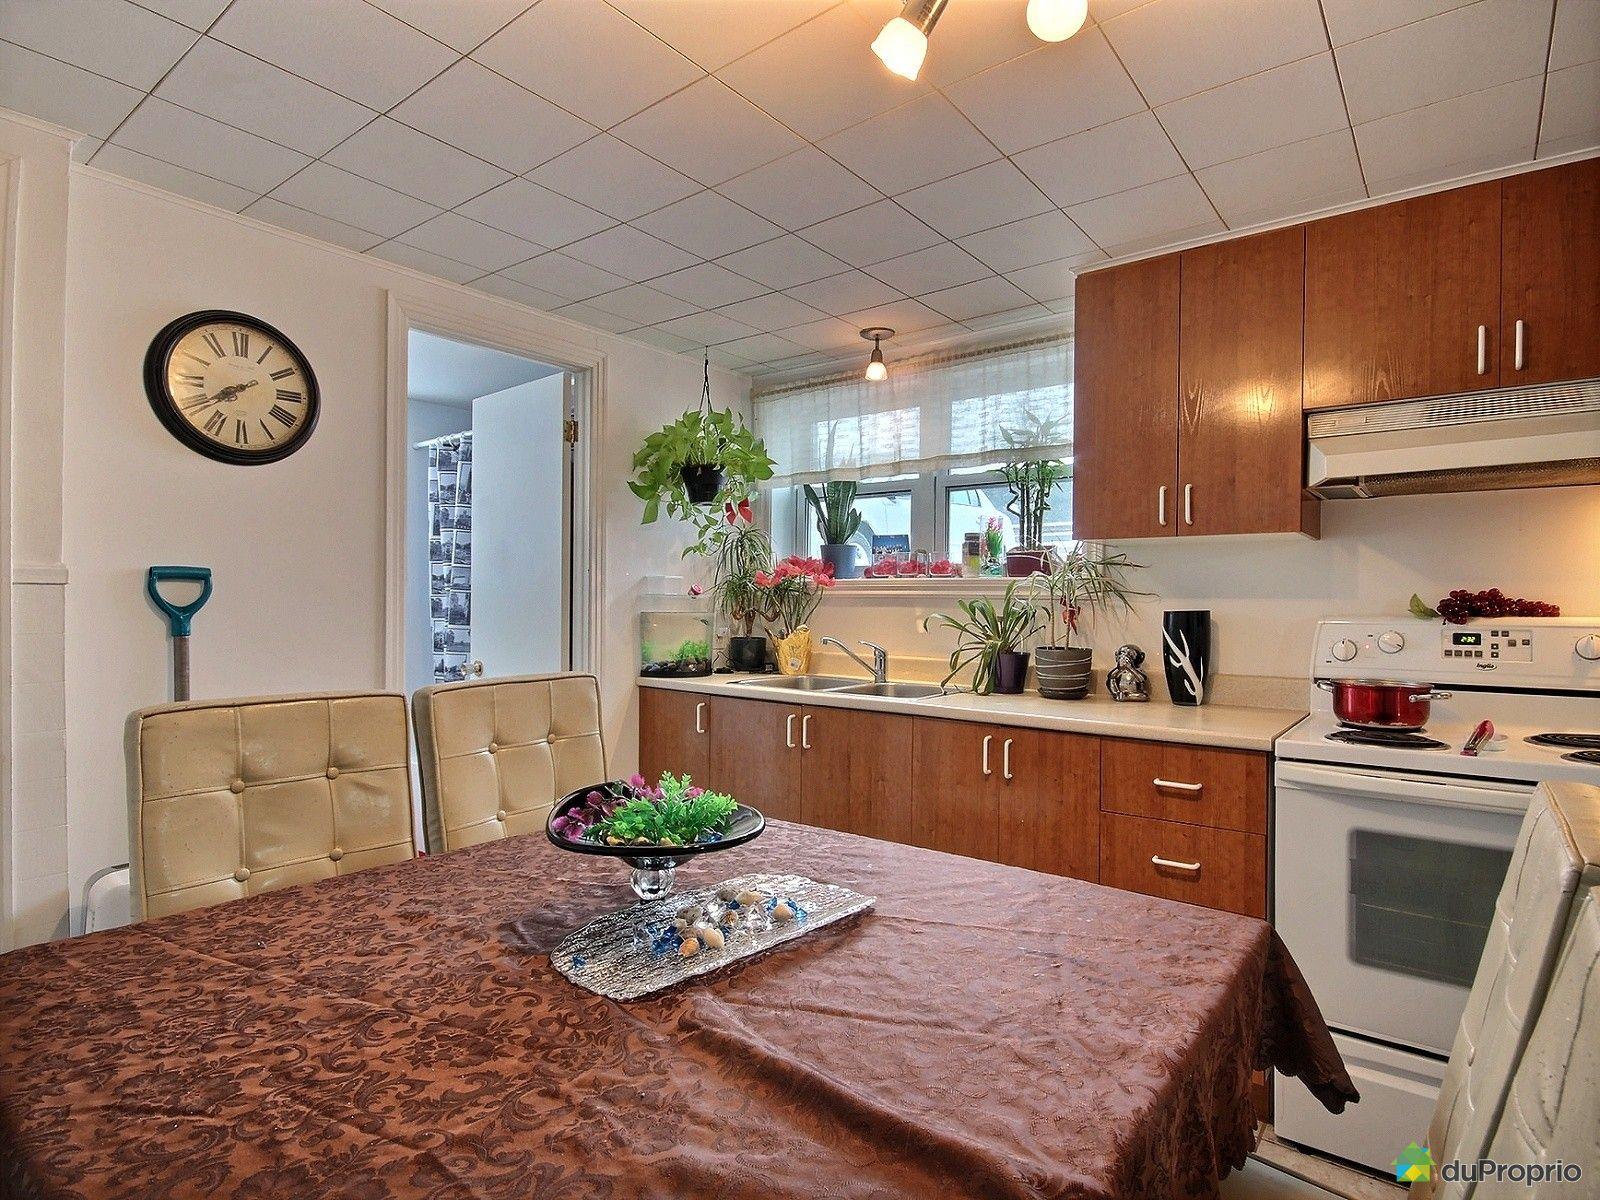 triplex vendre richelieu 239 241 243 immobilier qu bec duproprio 684703. Black Bedroom Furniture Sets. Home Design Ideas